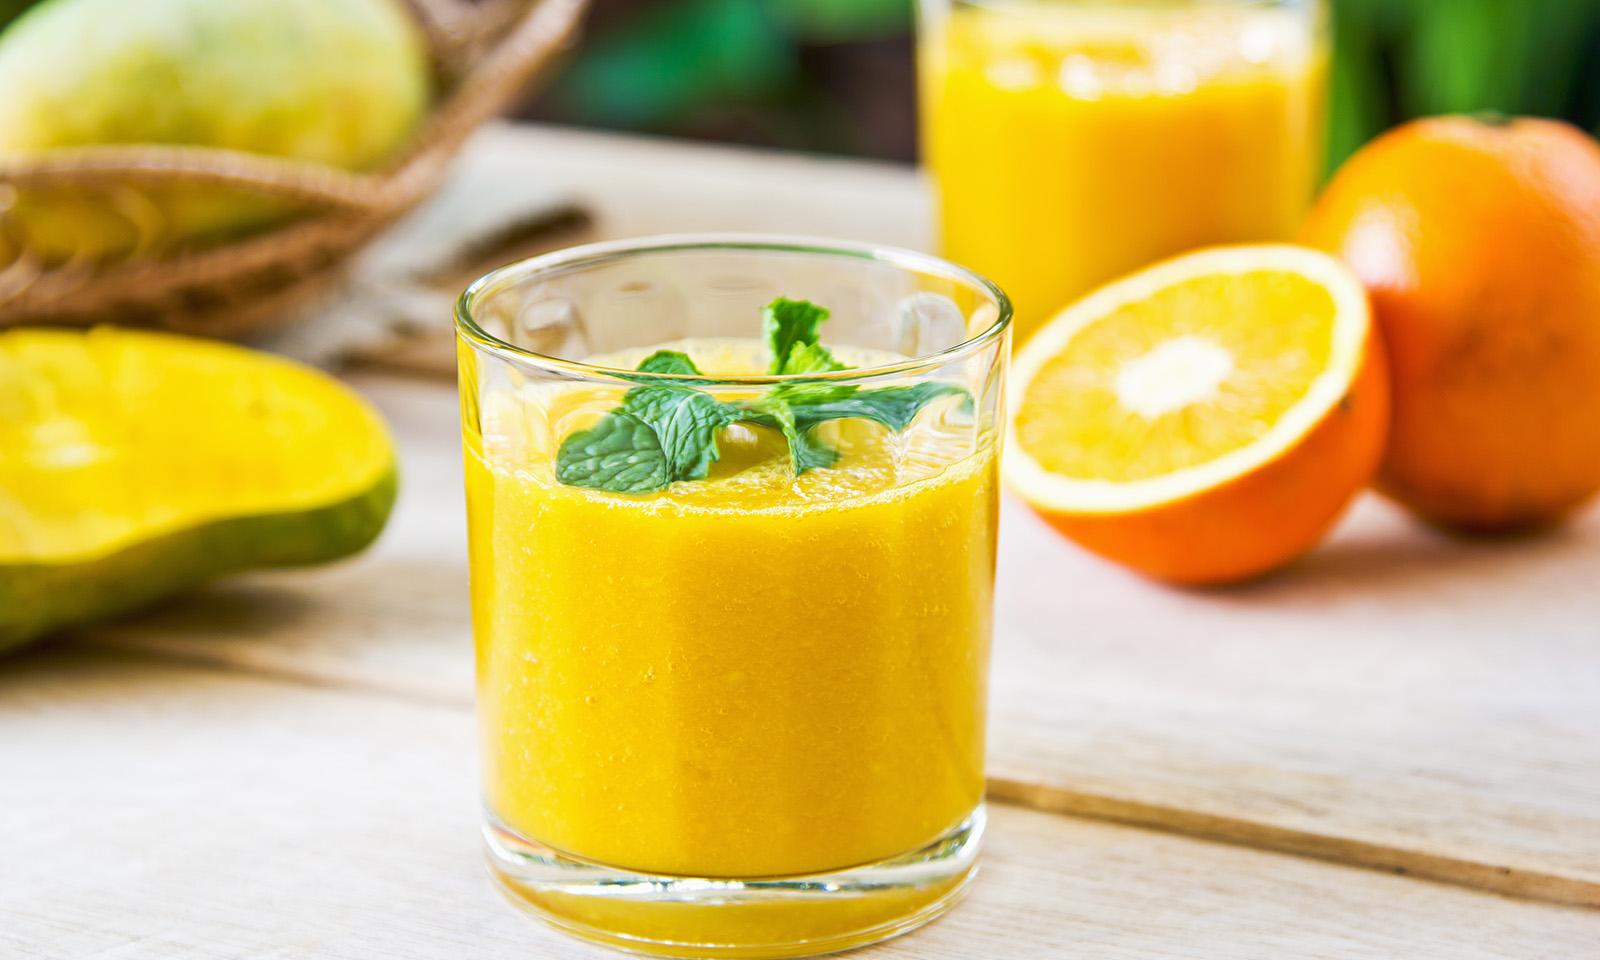 healing-with-citrus-peels-benefits-of-orange-rings-orange-juice